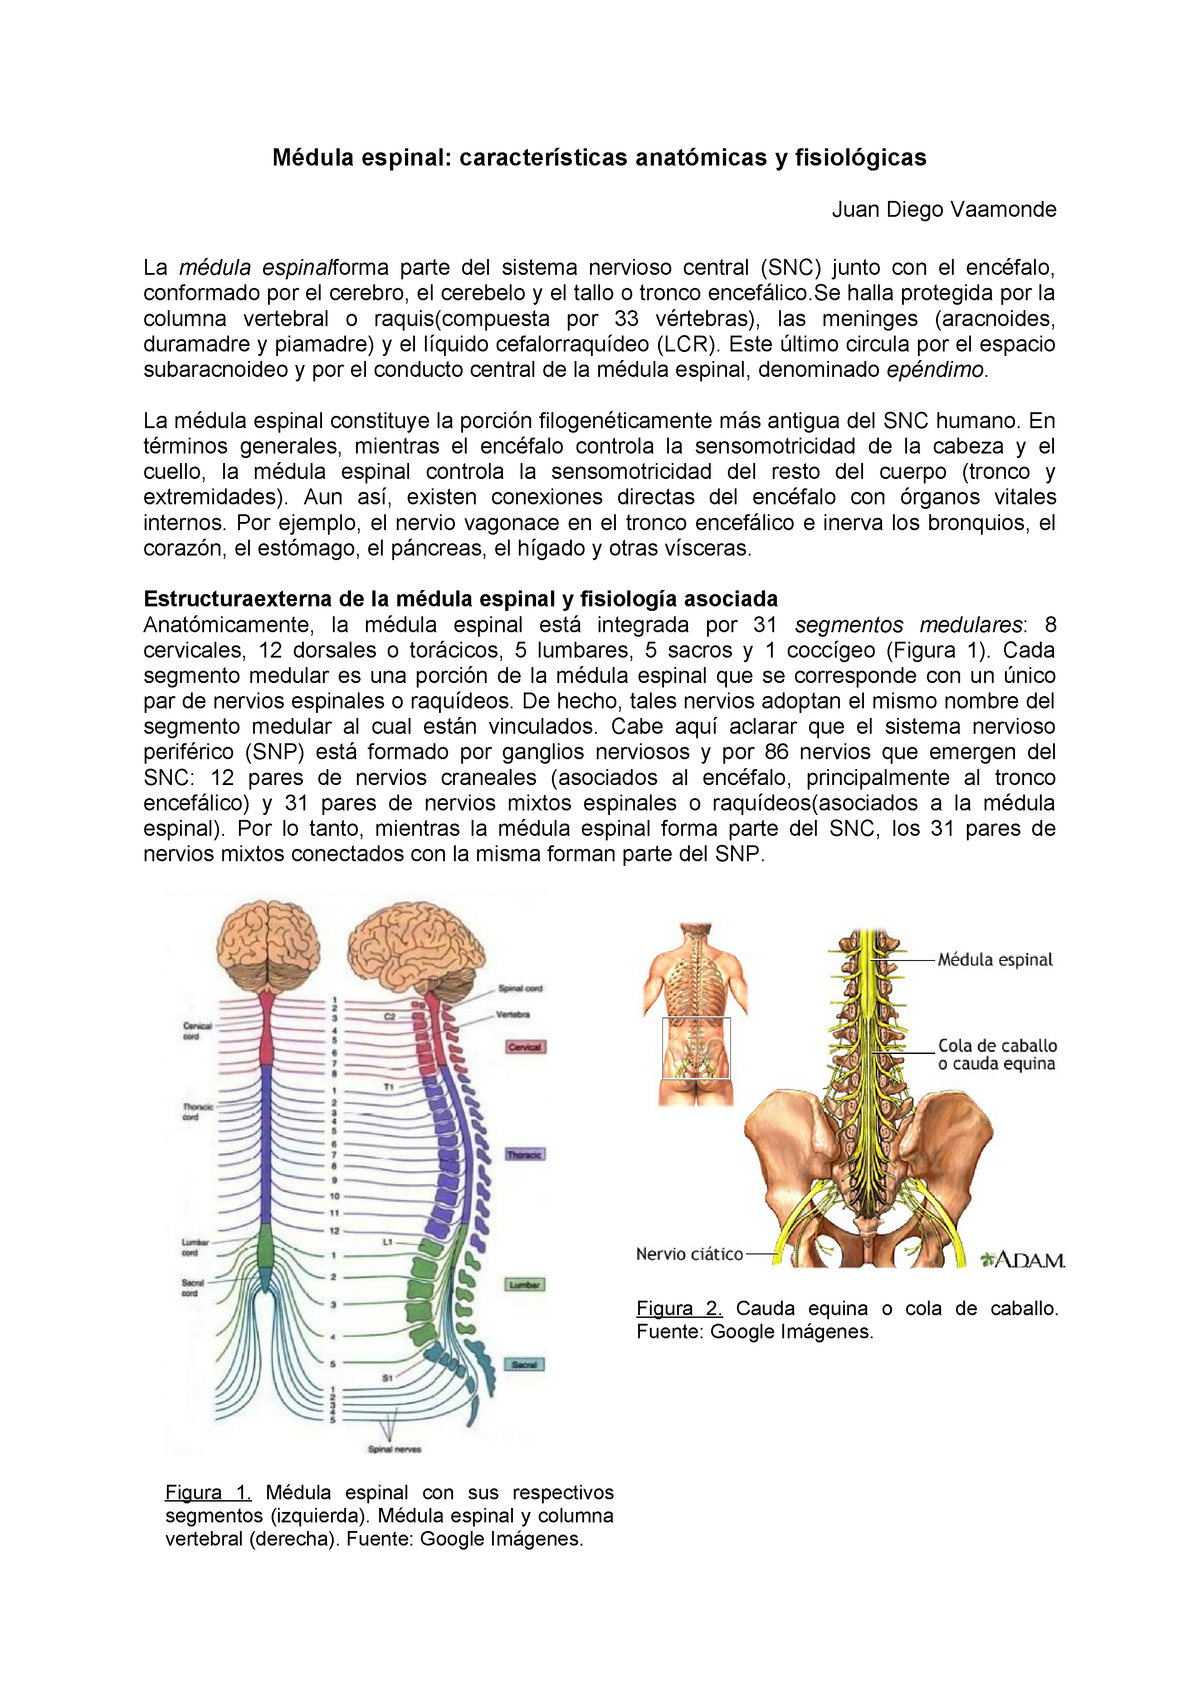 Médula Espinal Summary Anatomía Humana Unr Studocu